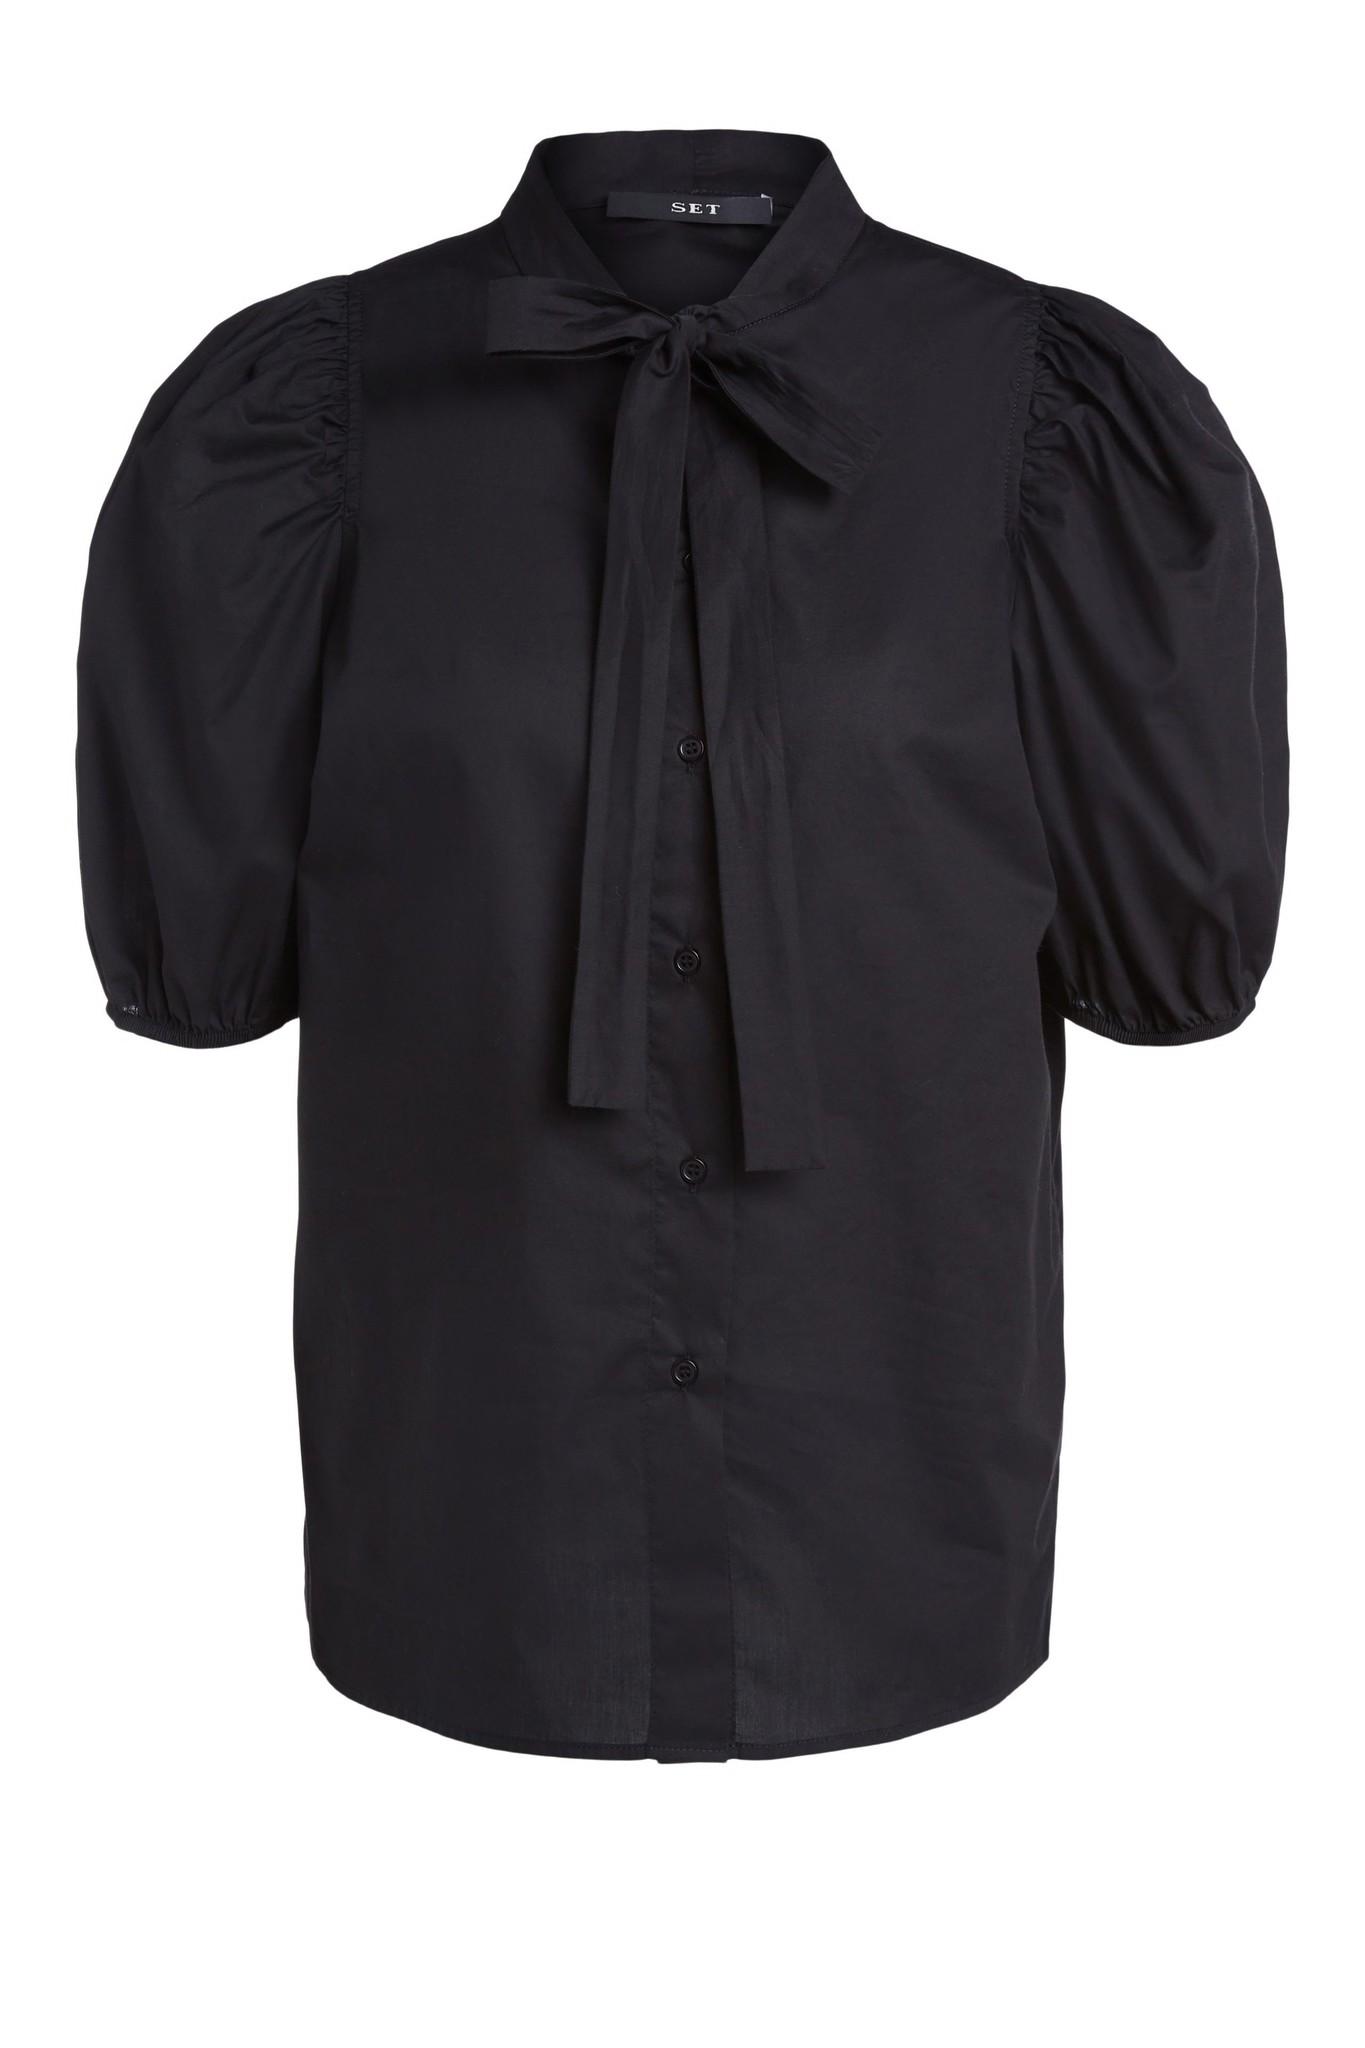 SET blouse 73629 9990-1